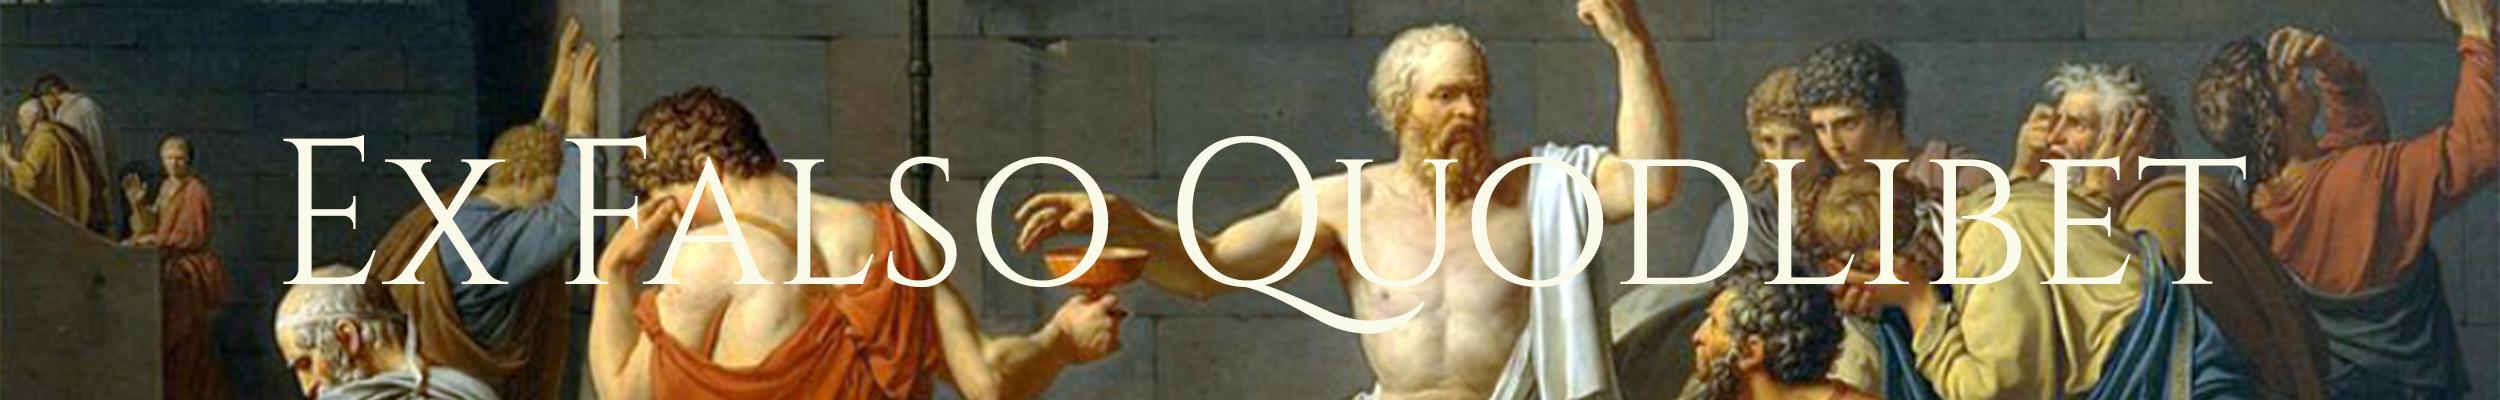 Ex Falso Quodlibet